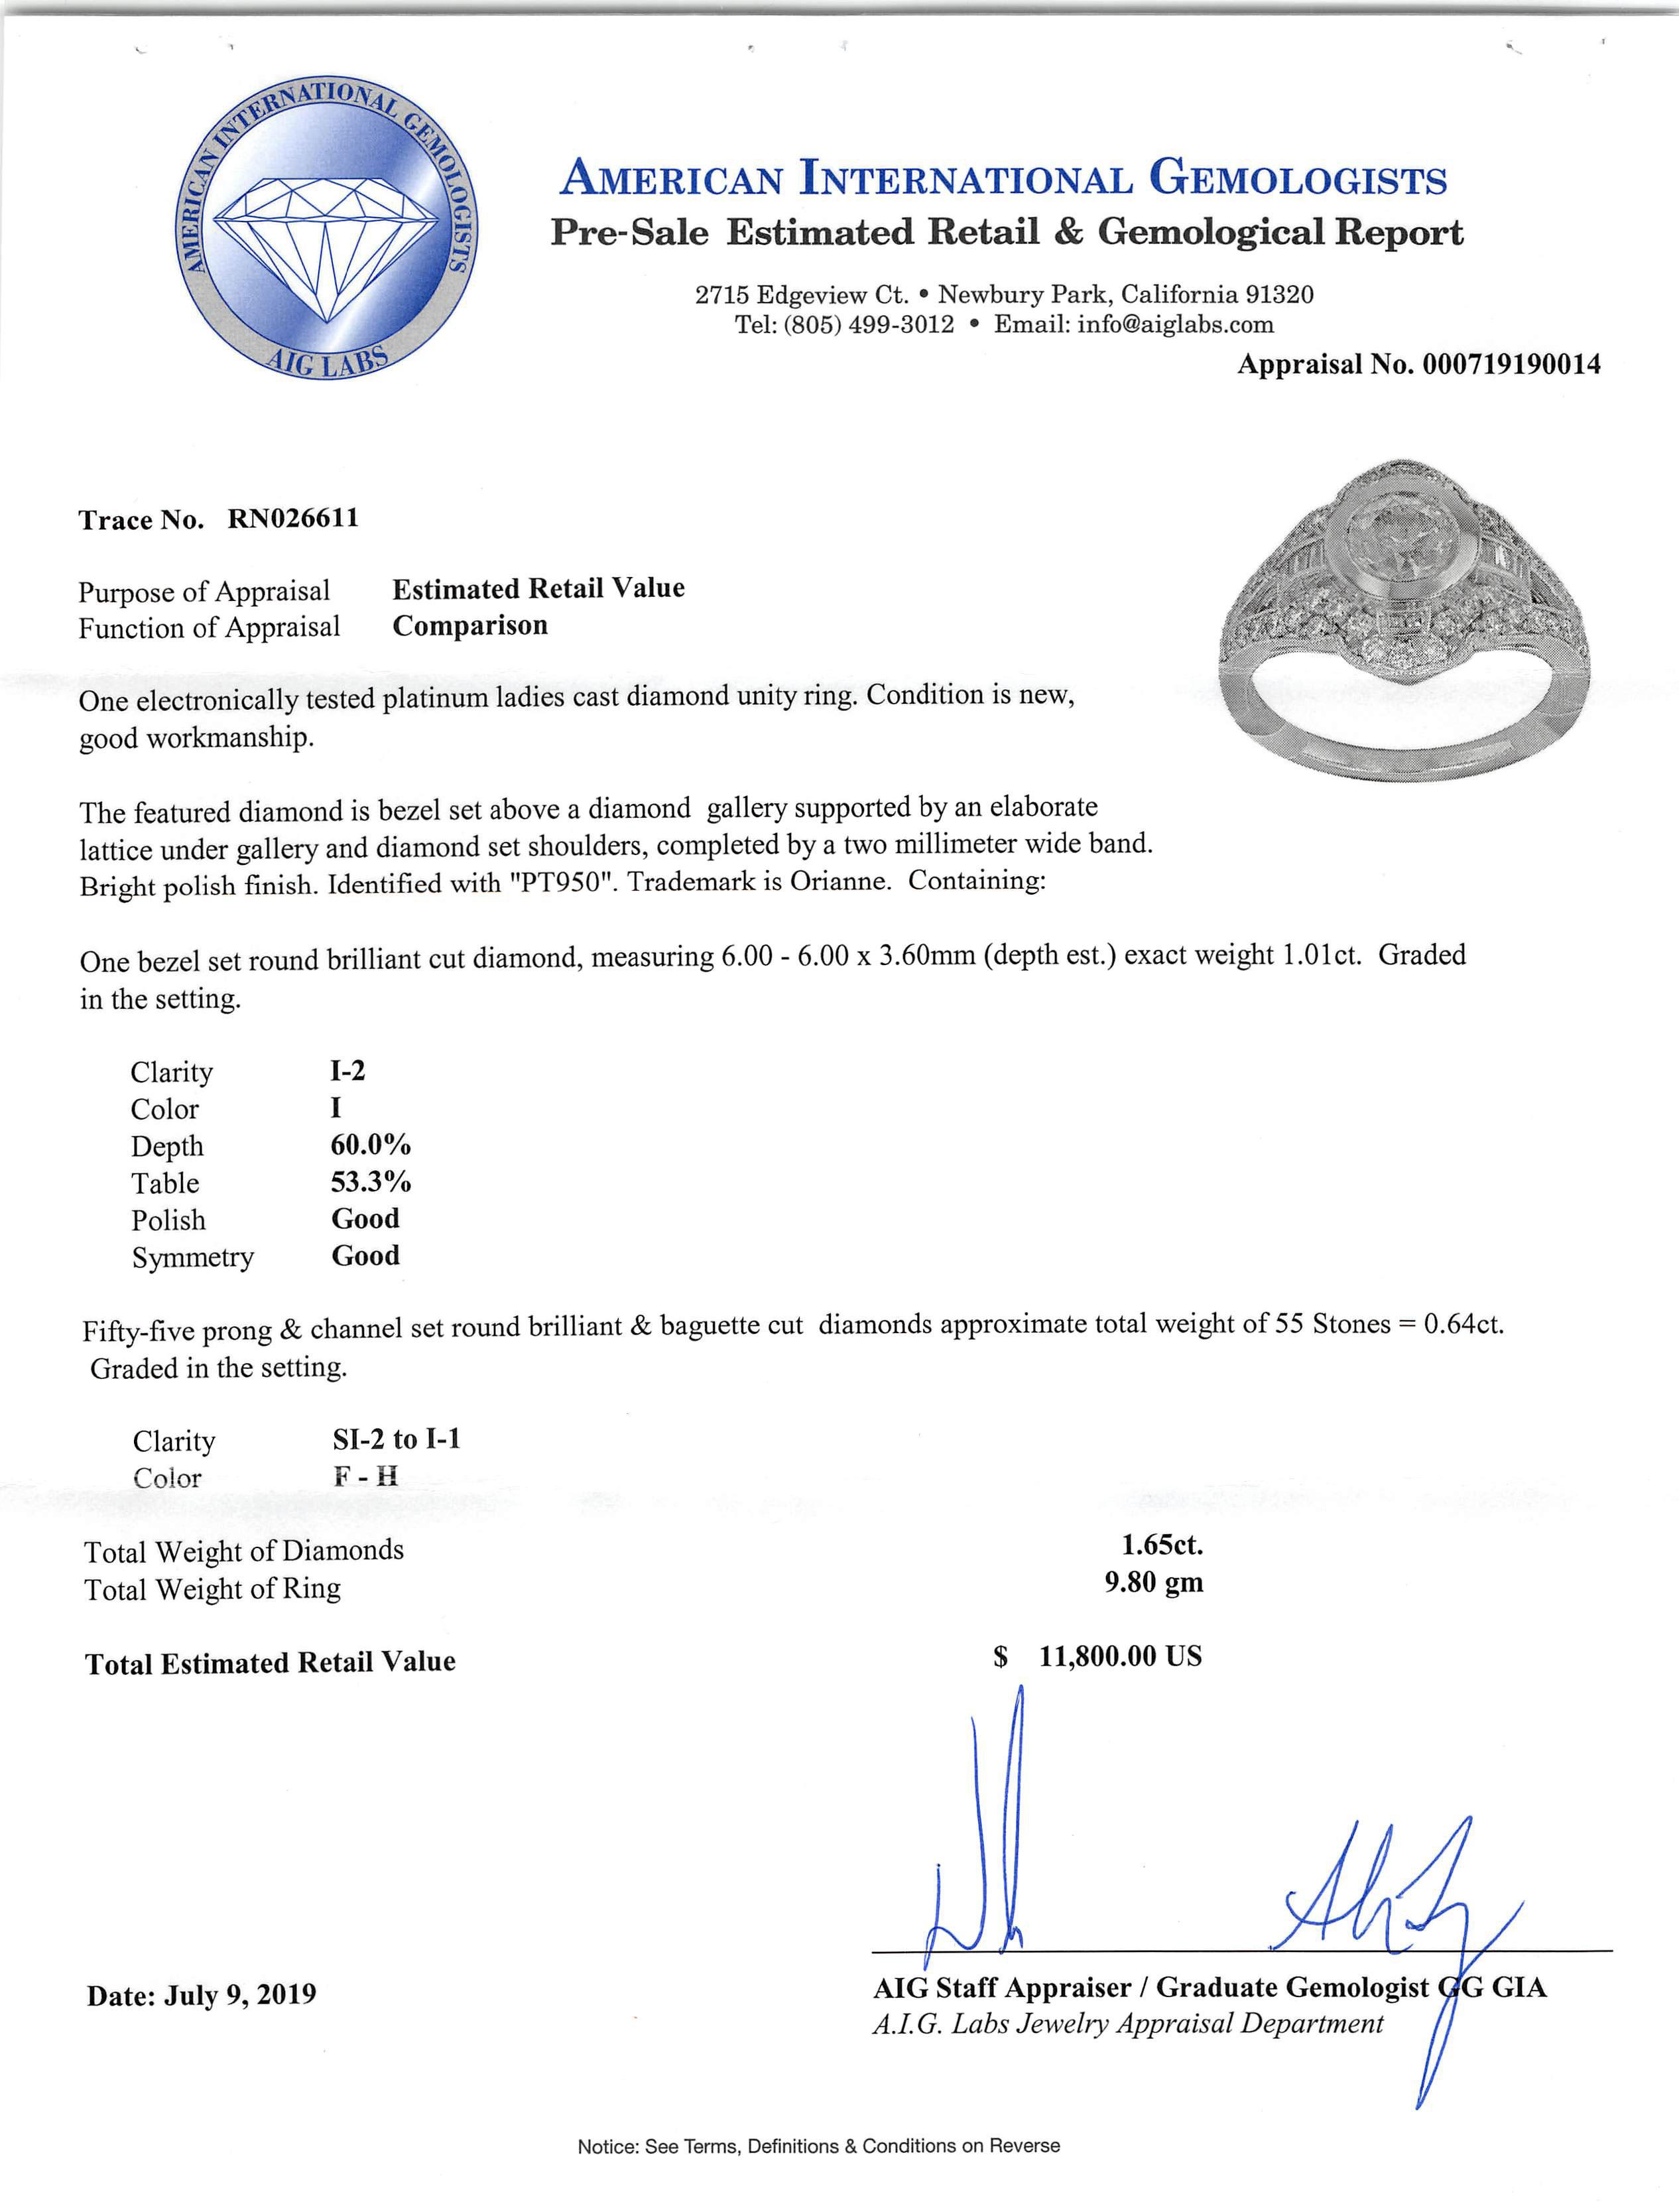 Lot 606 - Platinum and Diamond Ring , bezel set round brilliant cut diamond, exact wt. 1.01 cts., I color, I-2